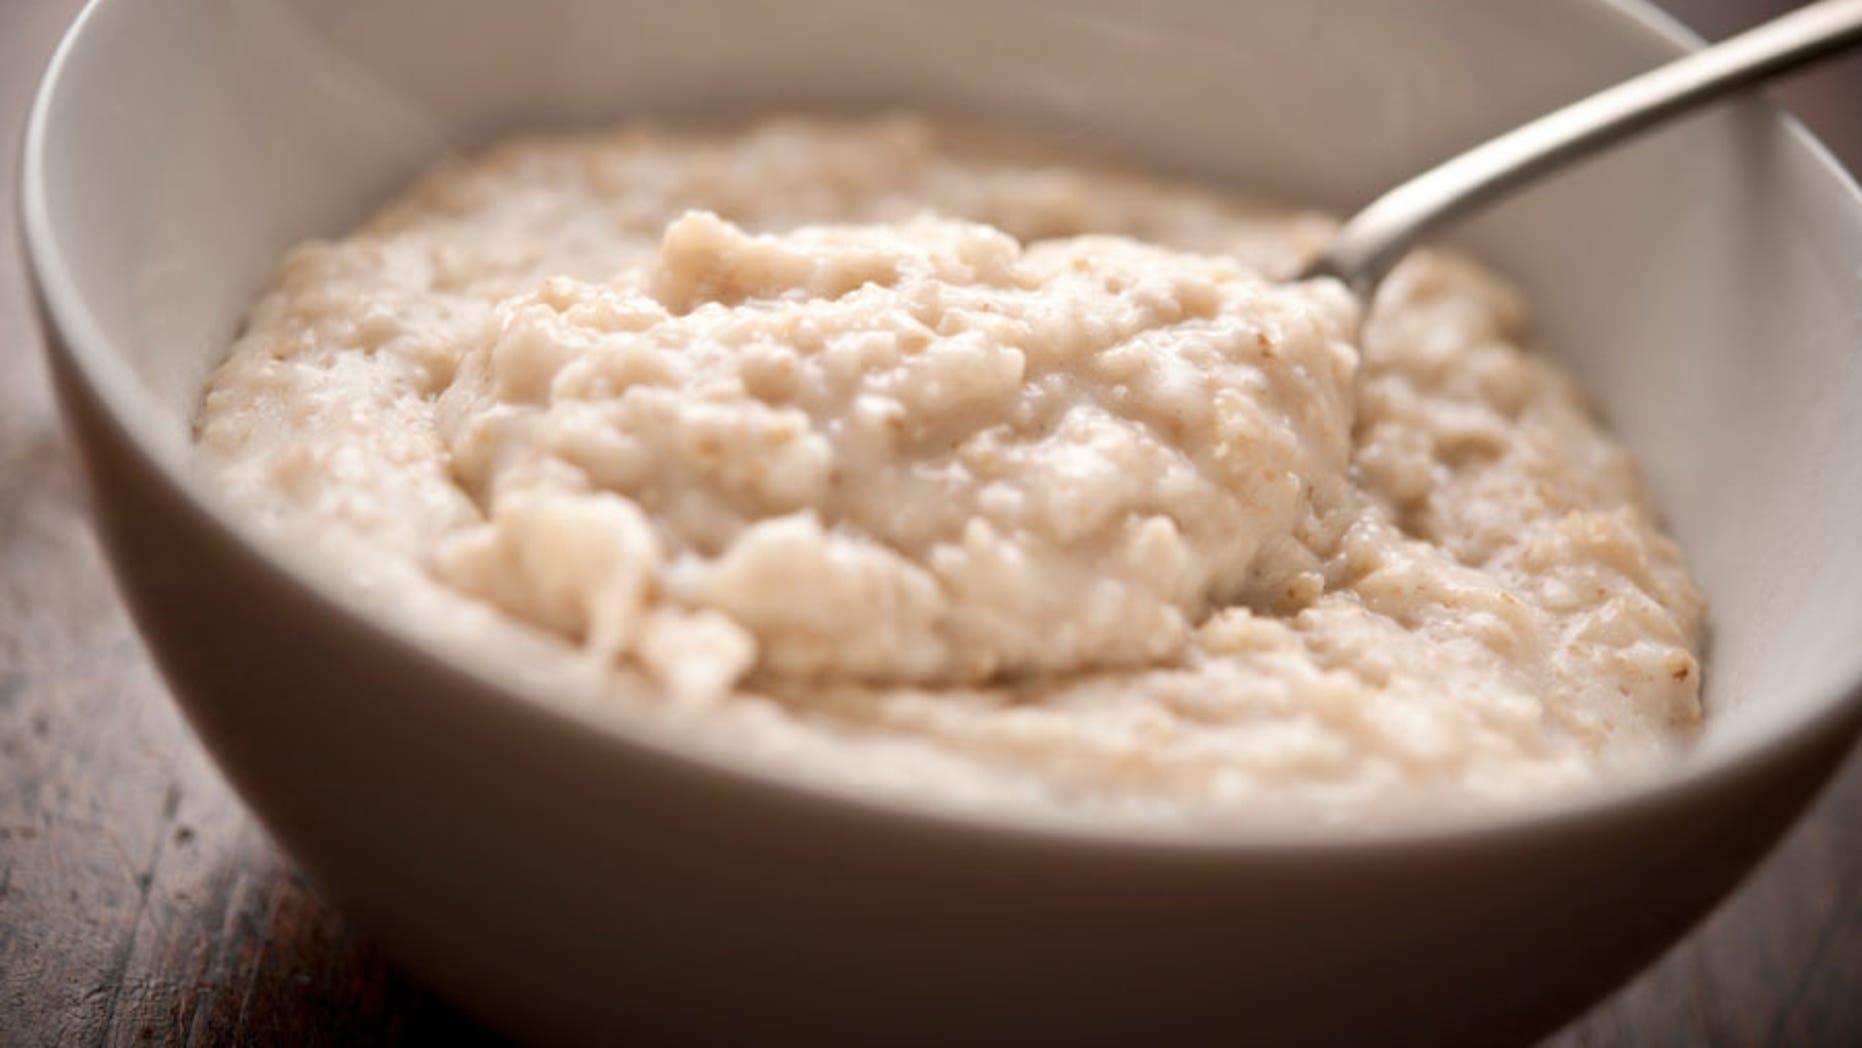 Mask of oatmeal: application rules, recipes